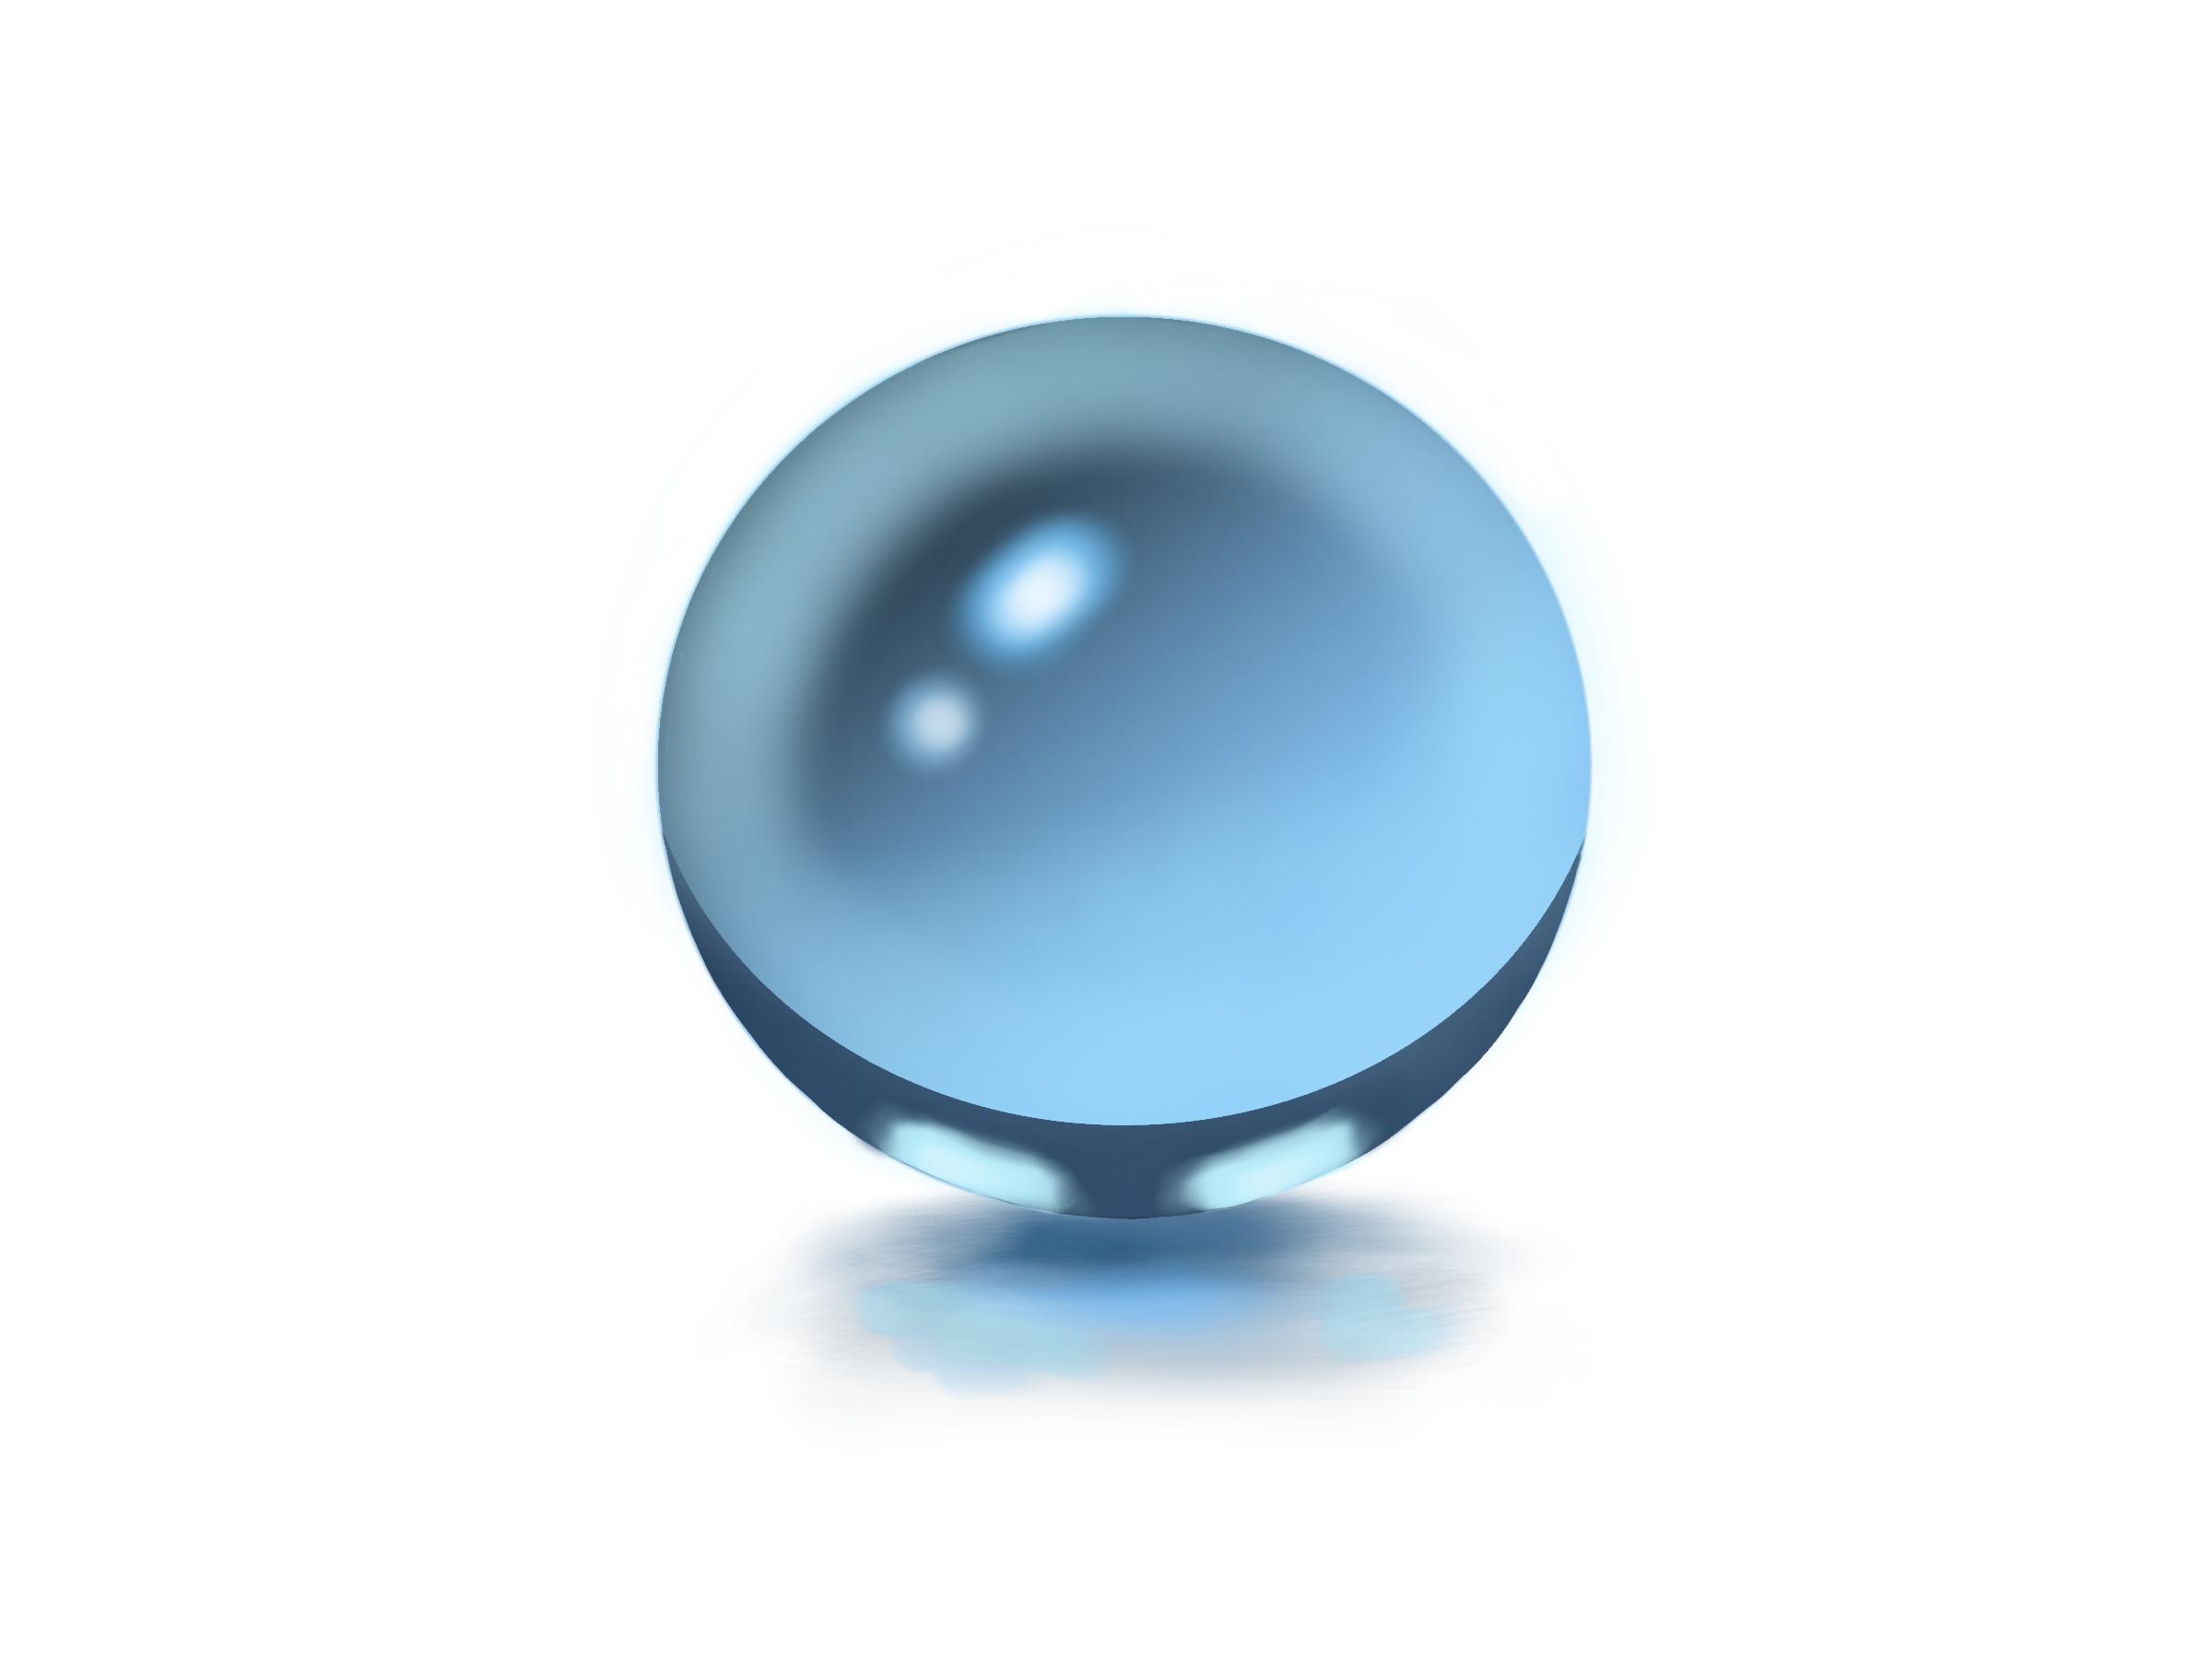 Glass ball by lluvia on deviantart